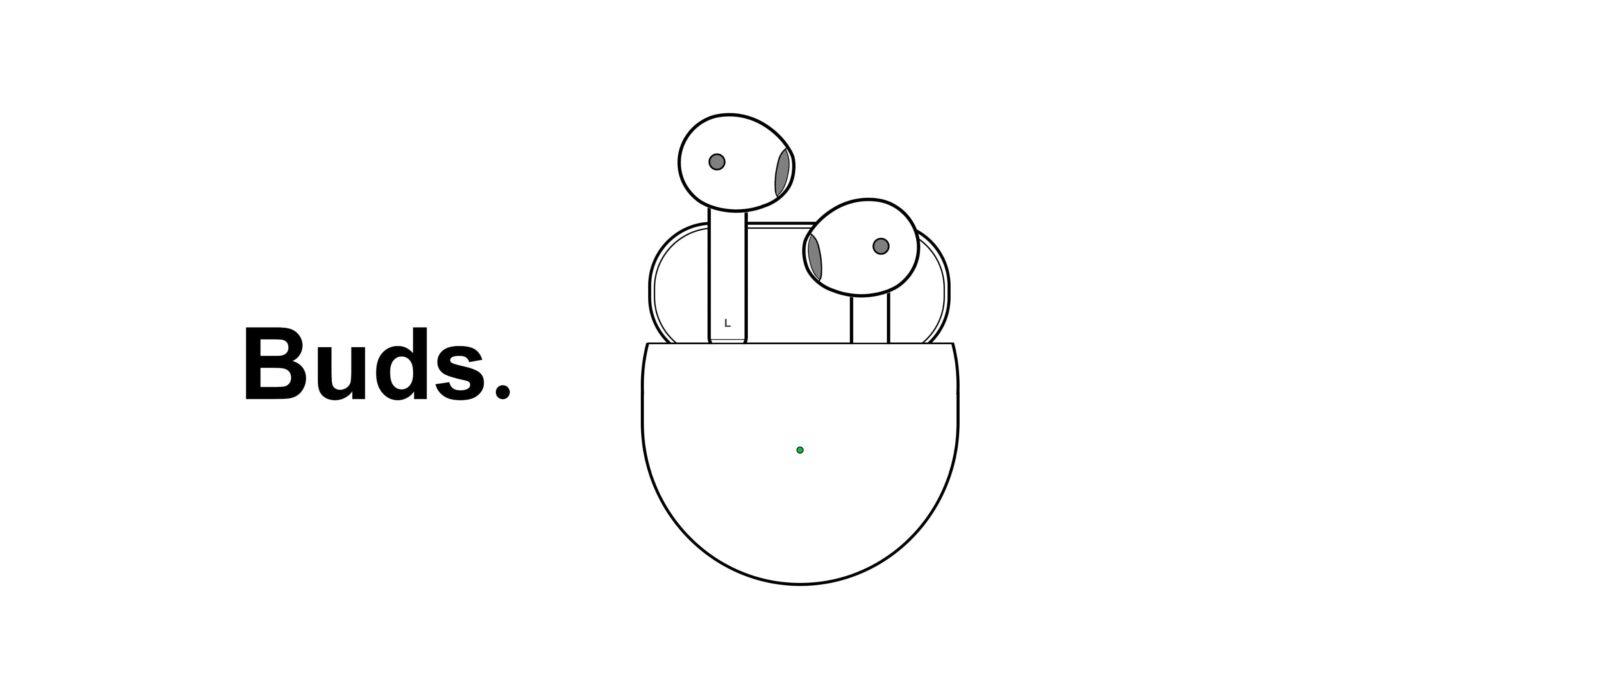 boceto-OnePlus-Buds